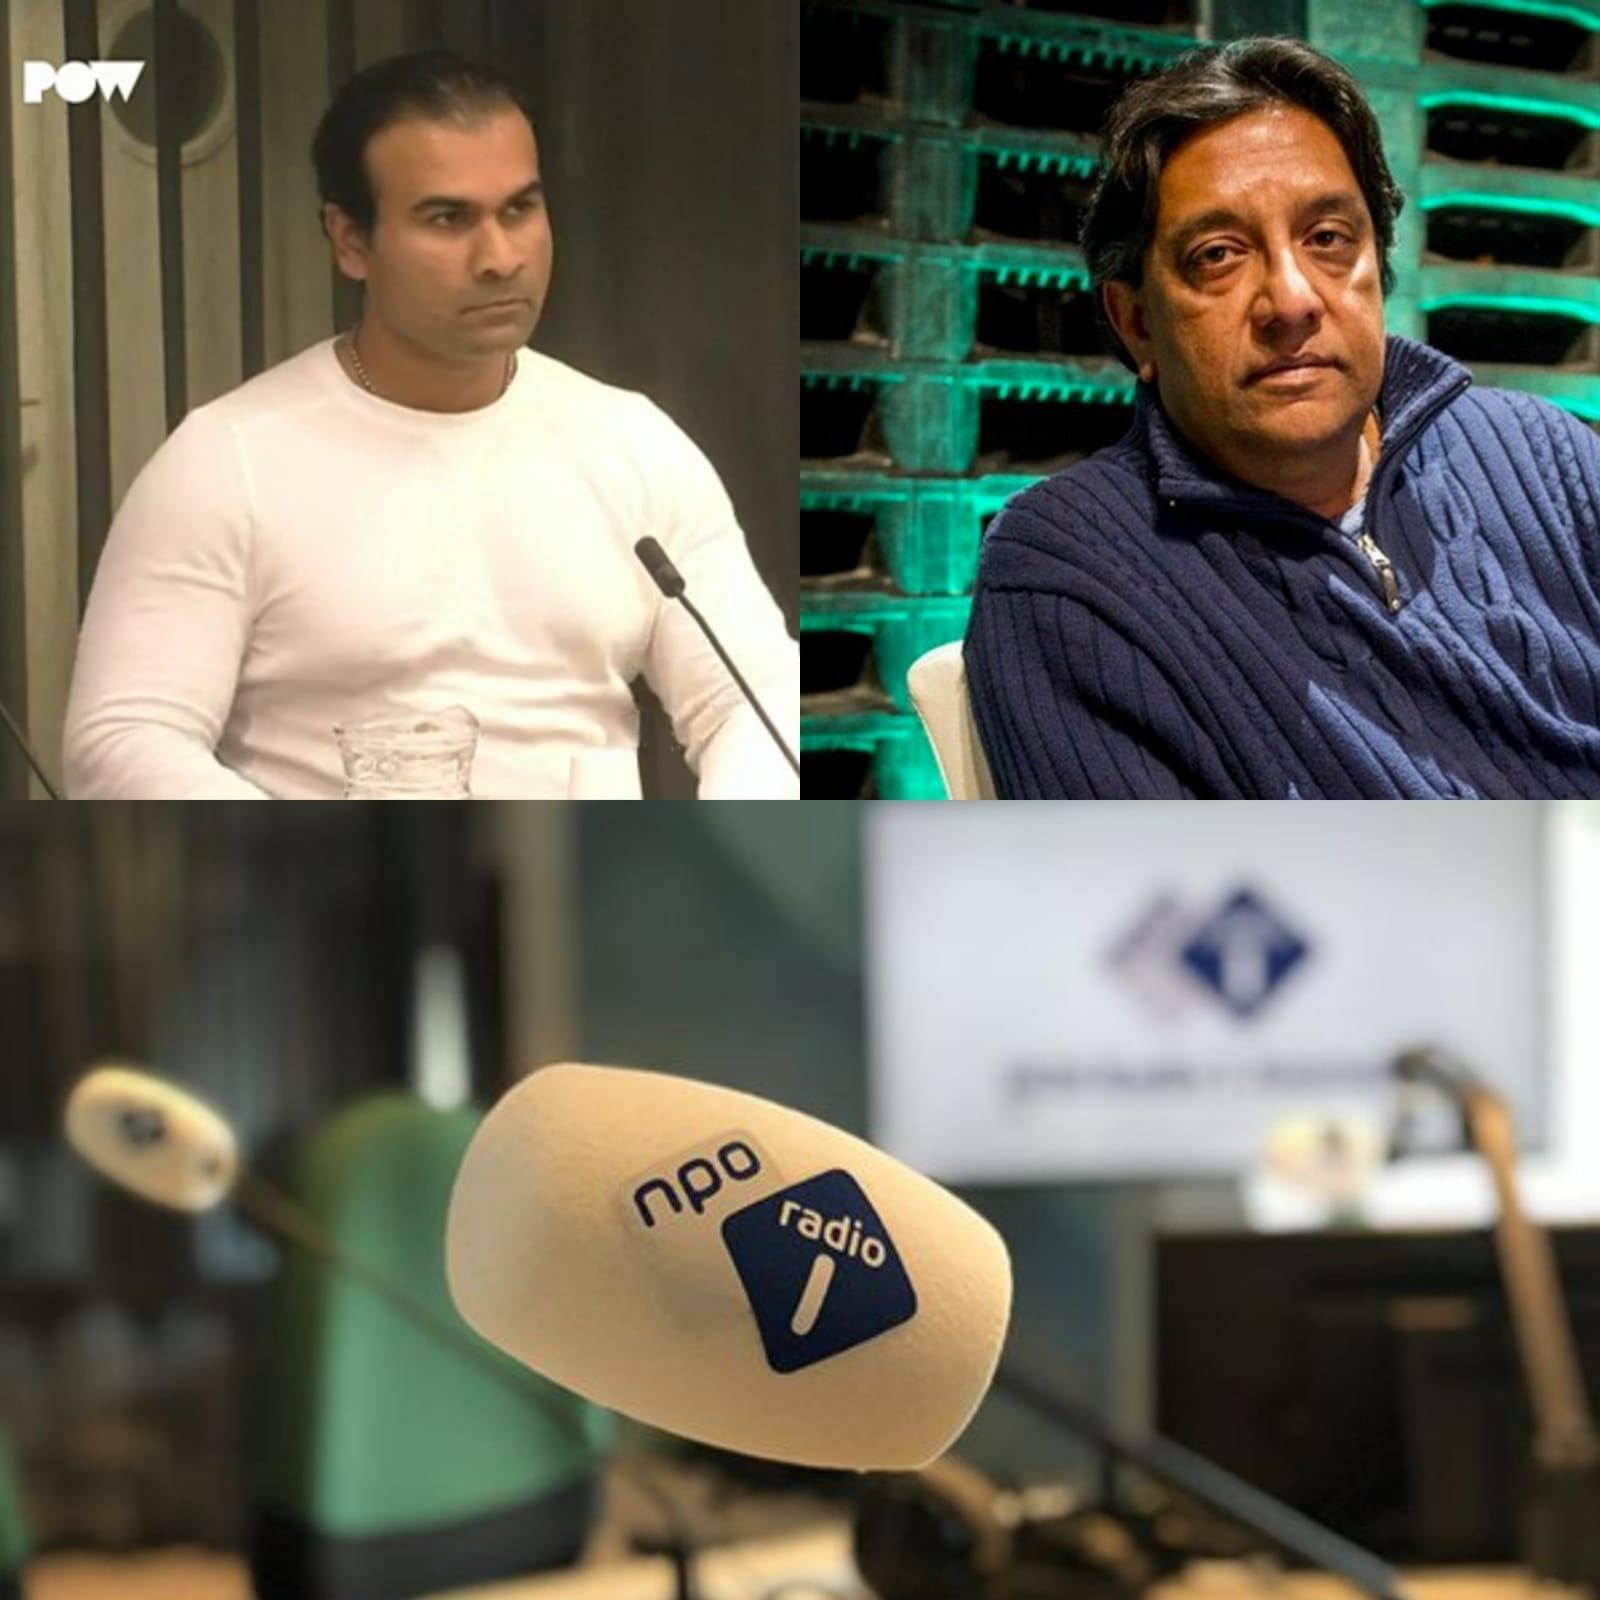 Divali met Prem Radhakishun op NPO Radio 1